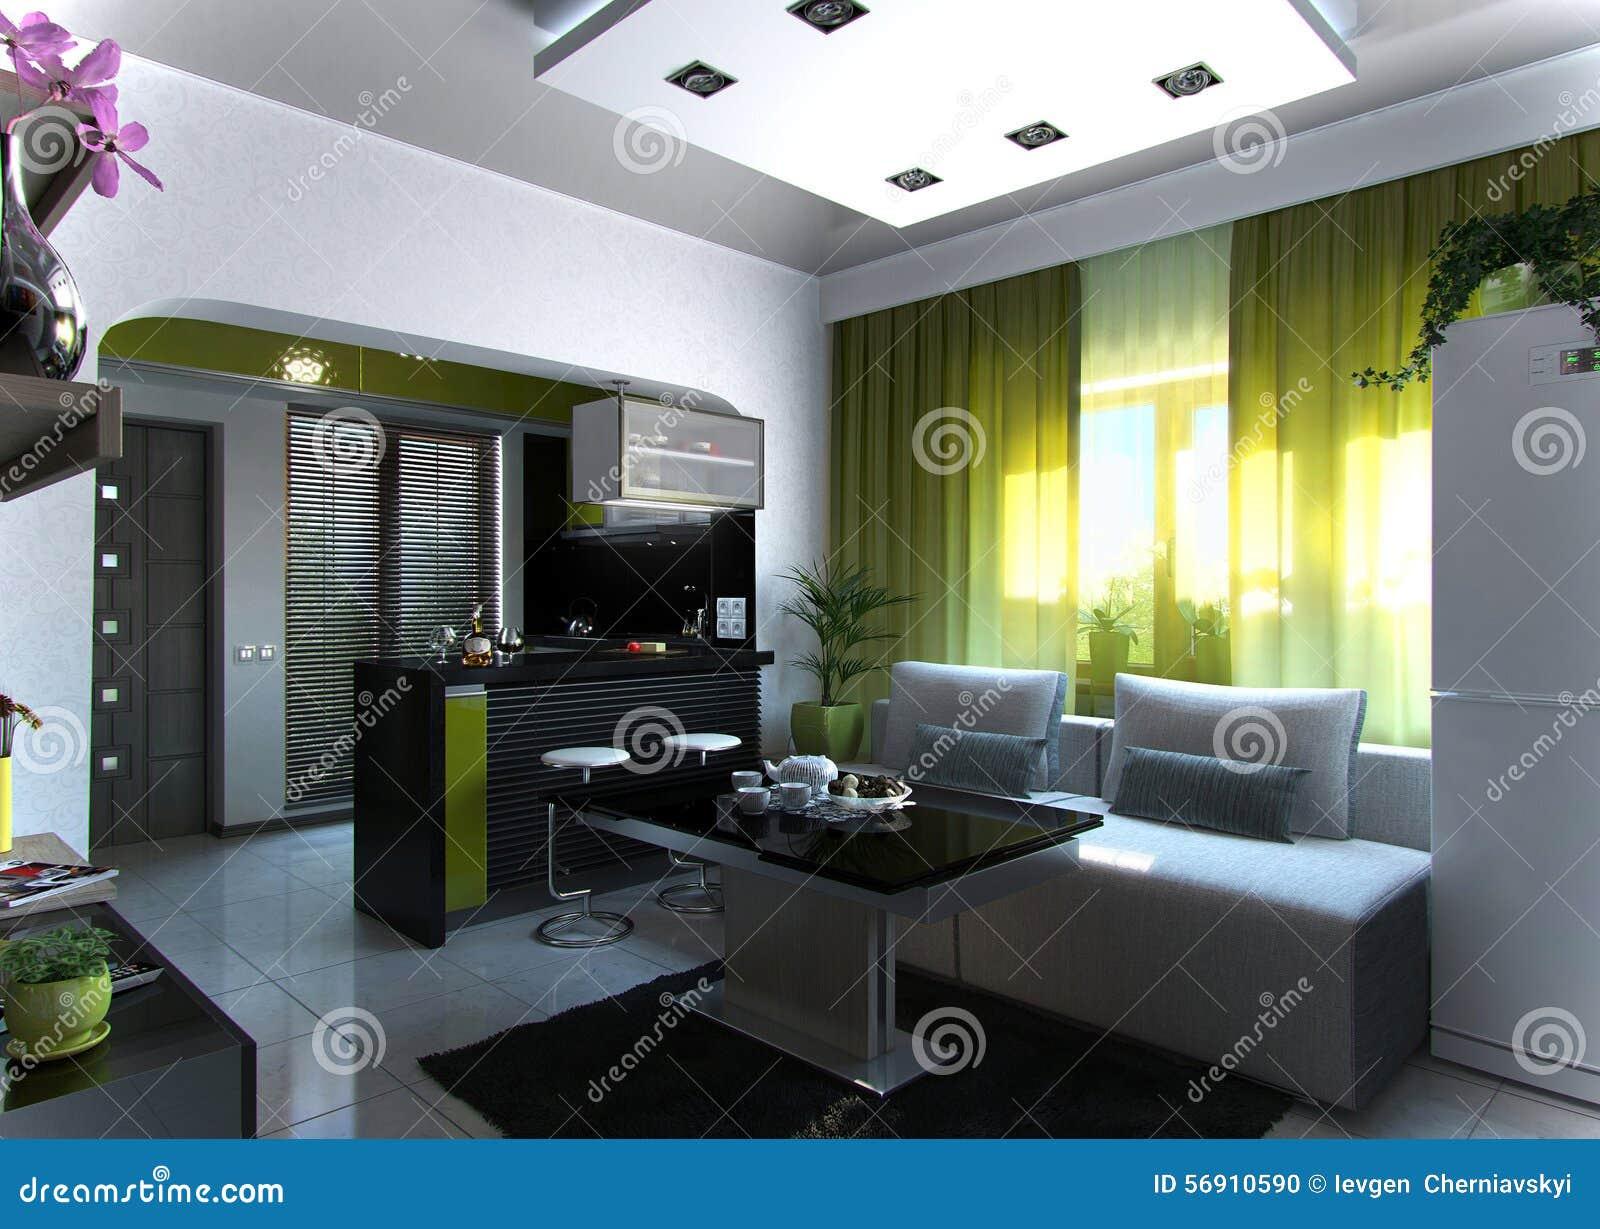 Open Concept Living Room And Kitchen Scene 3, 3D Rendering ...